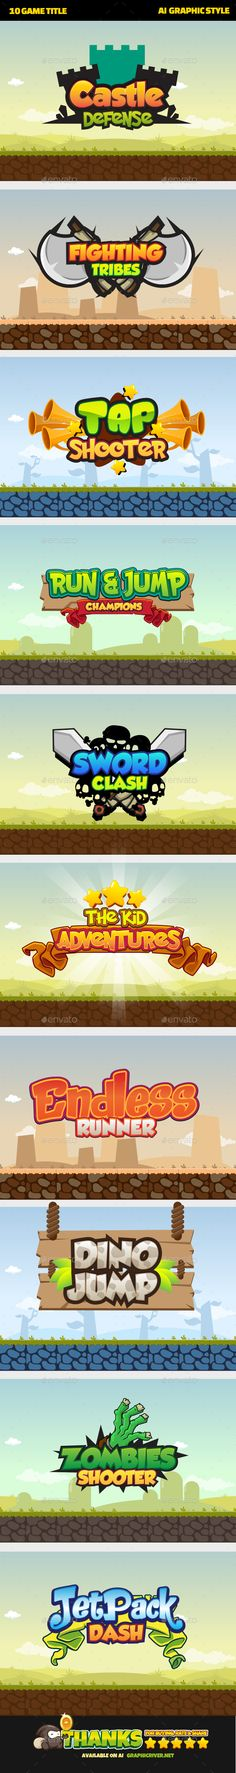 Game Title Download here: https://graphicriver.net/item/game-title/19581099?ref=KlitVogli